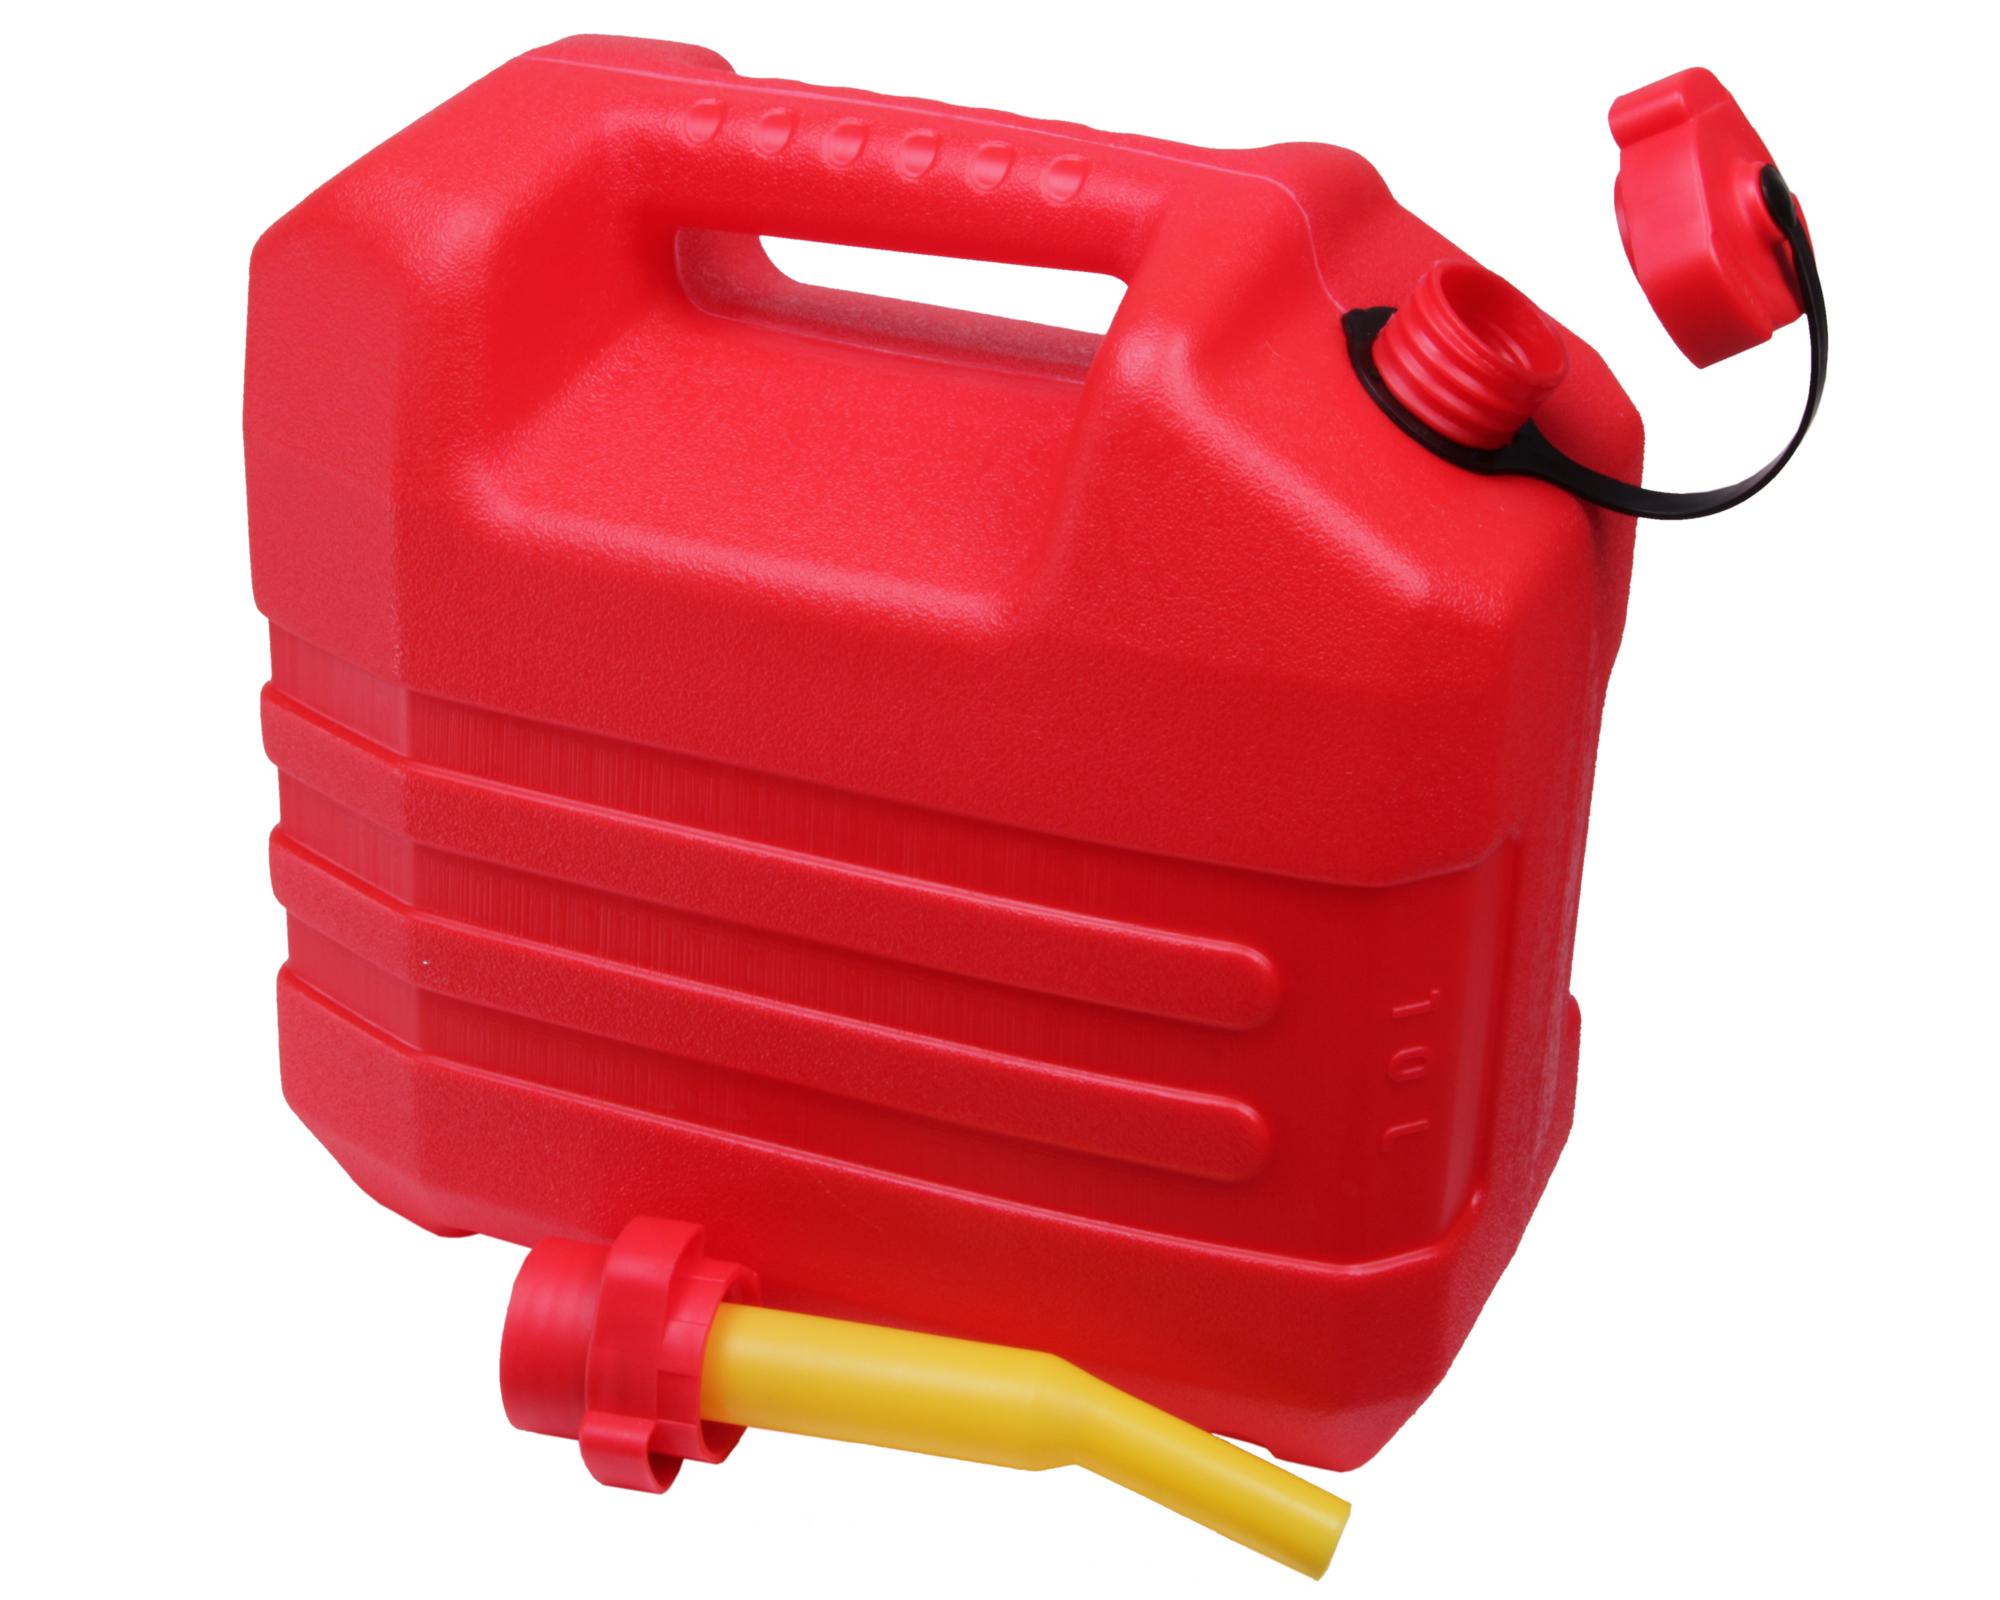 ondis24 benzinkanister 10 liter tropfsicher. Black Bedroom Furniture Sets. Home Design Ideas